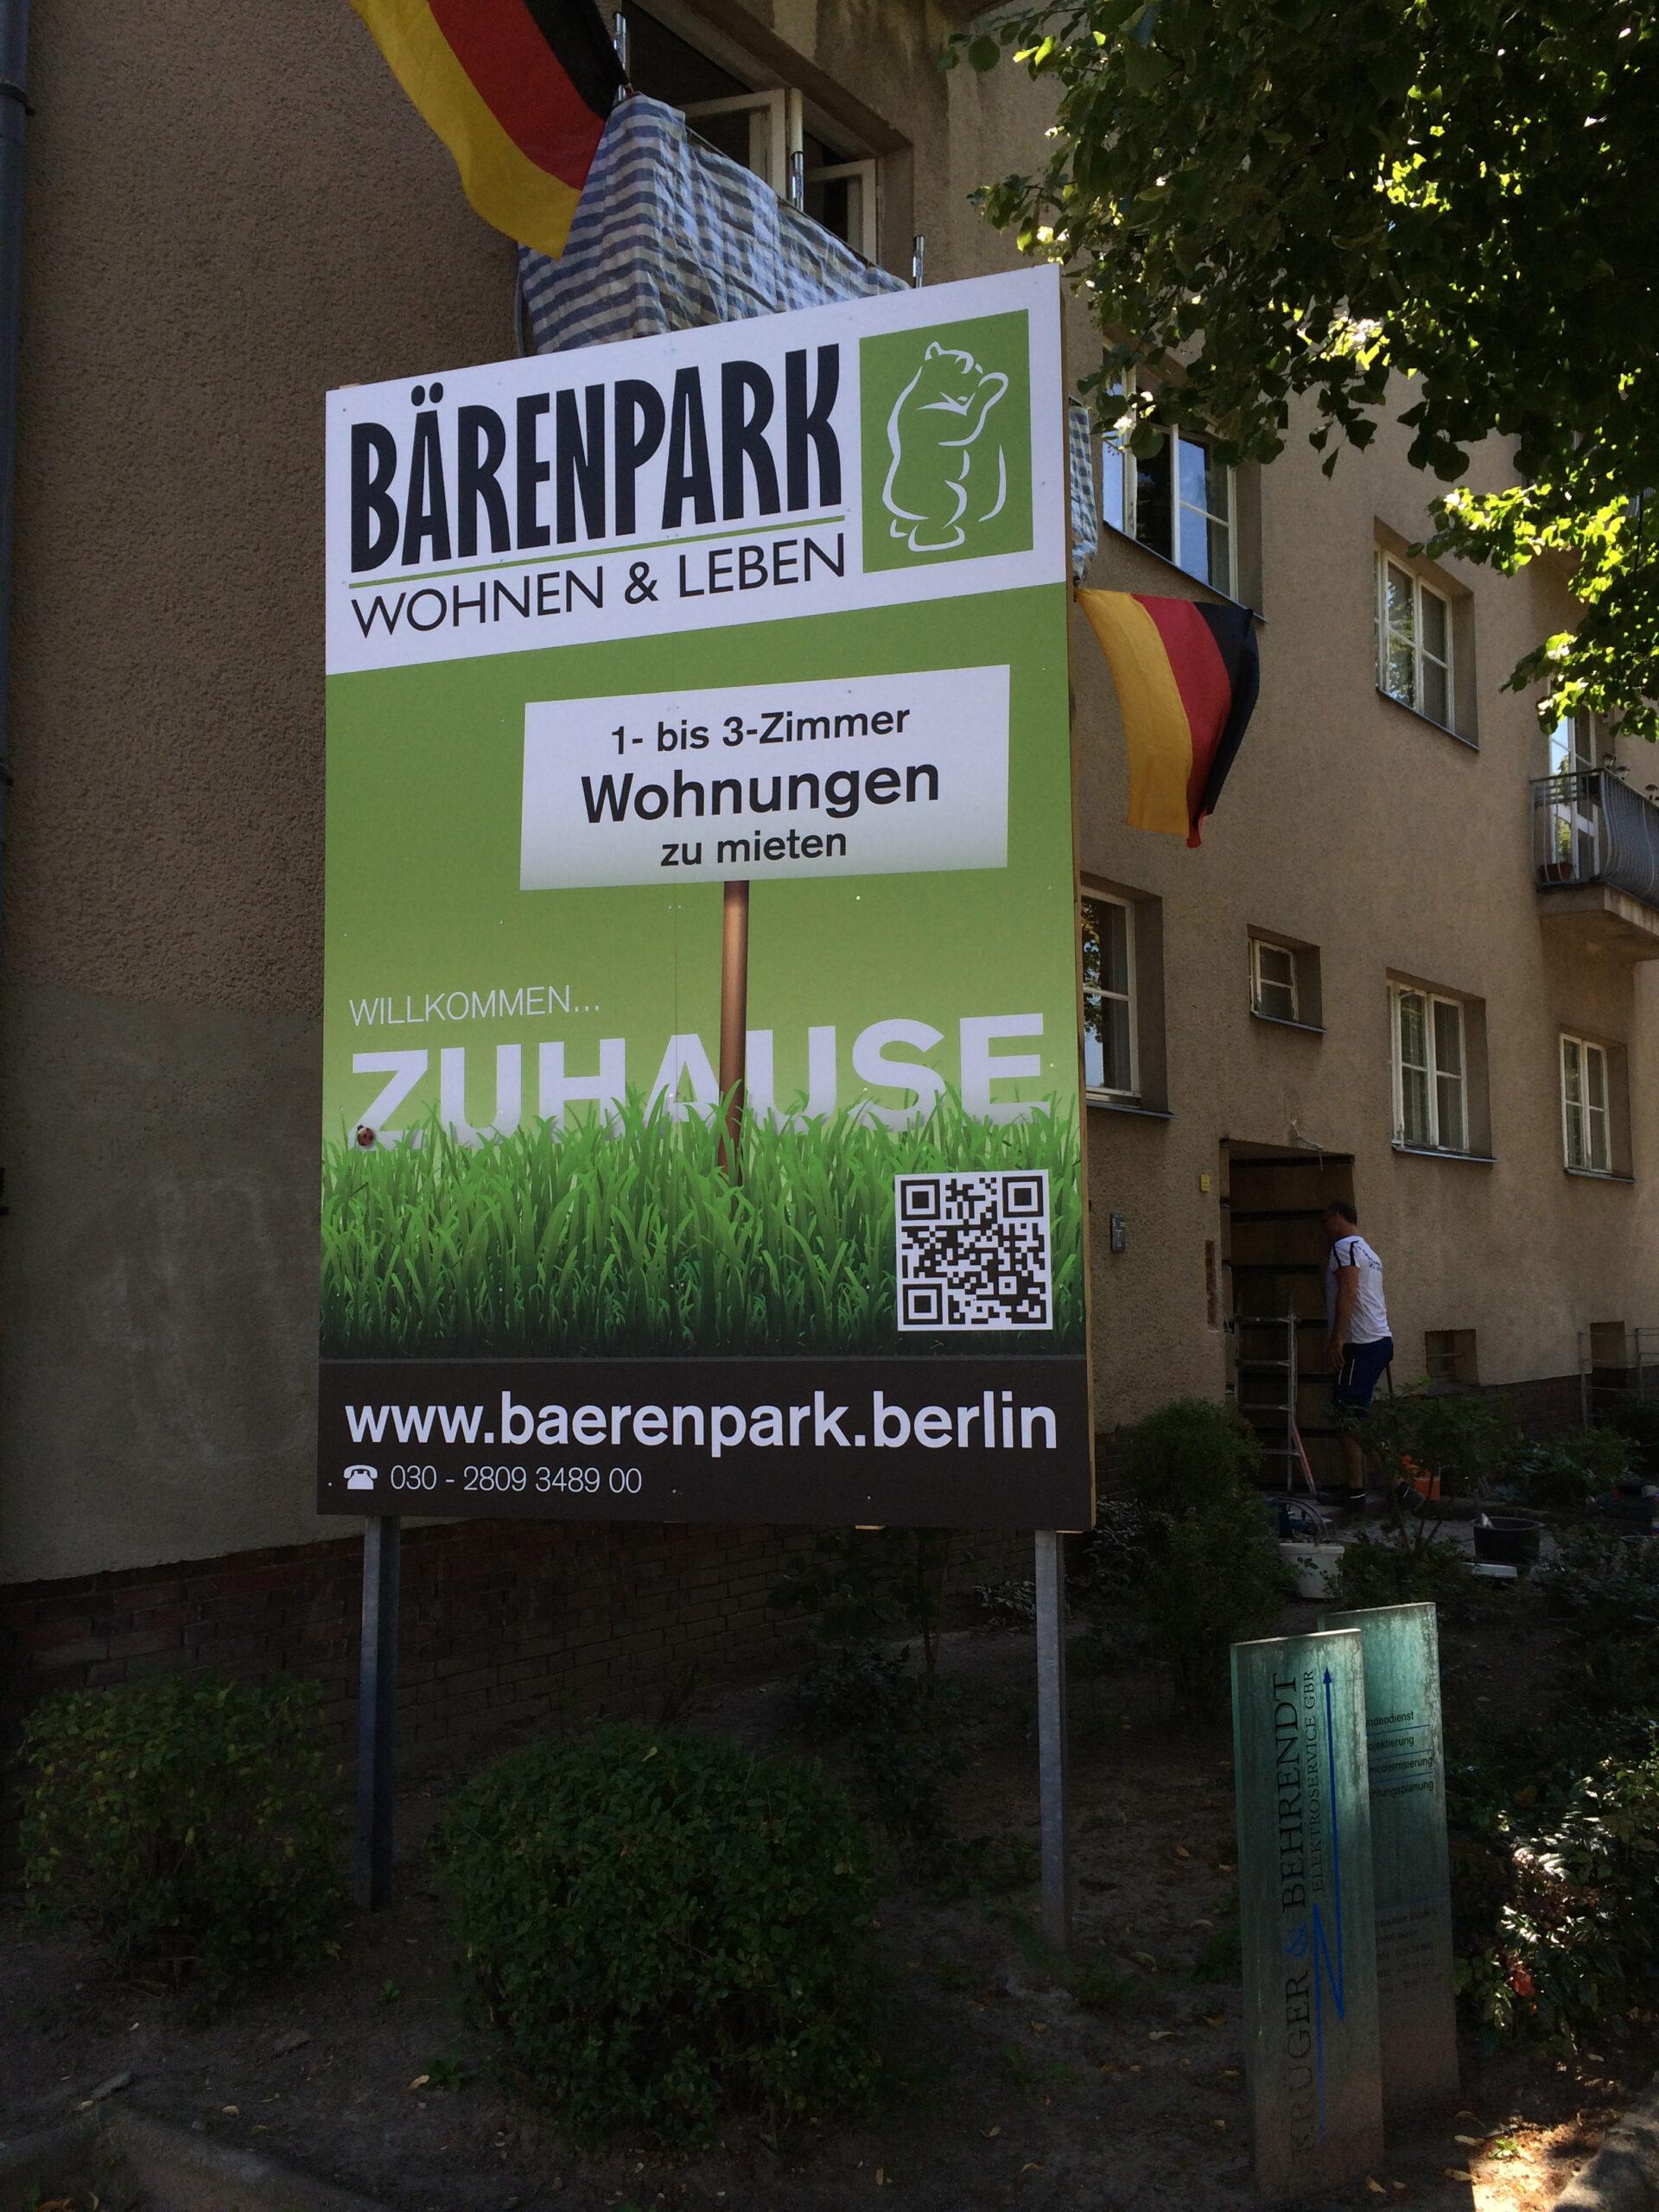 Bautafel-Berlin-Dibond-Matti-Michalke-Berlin-Brandenburg-Aussenwerbung-Innenwerbung-Banner-Planen-Folien-Werbemittel-Druck-Print